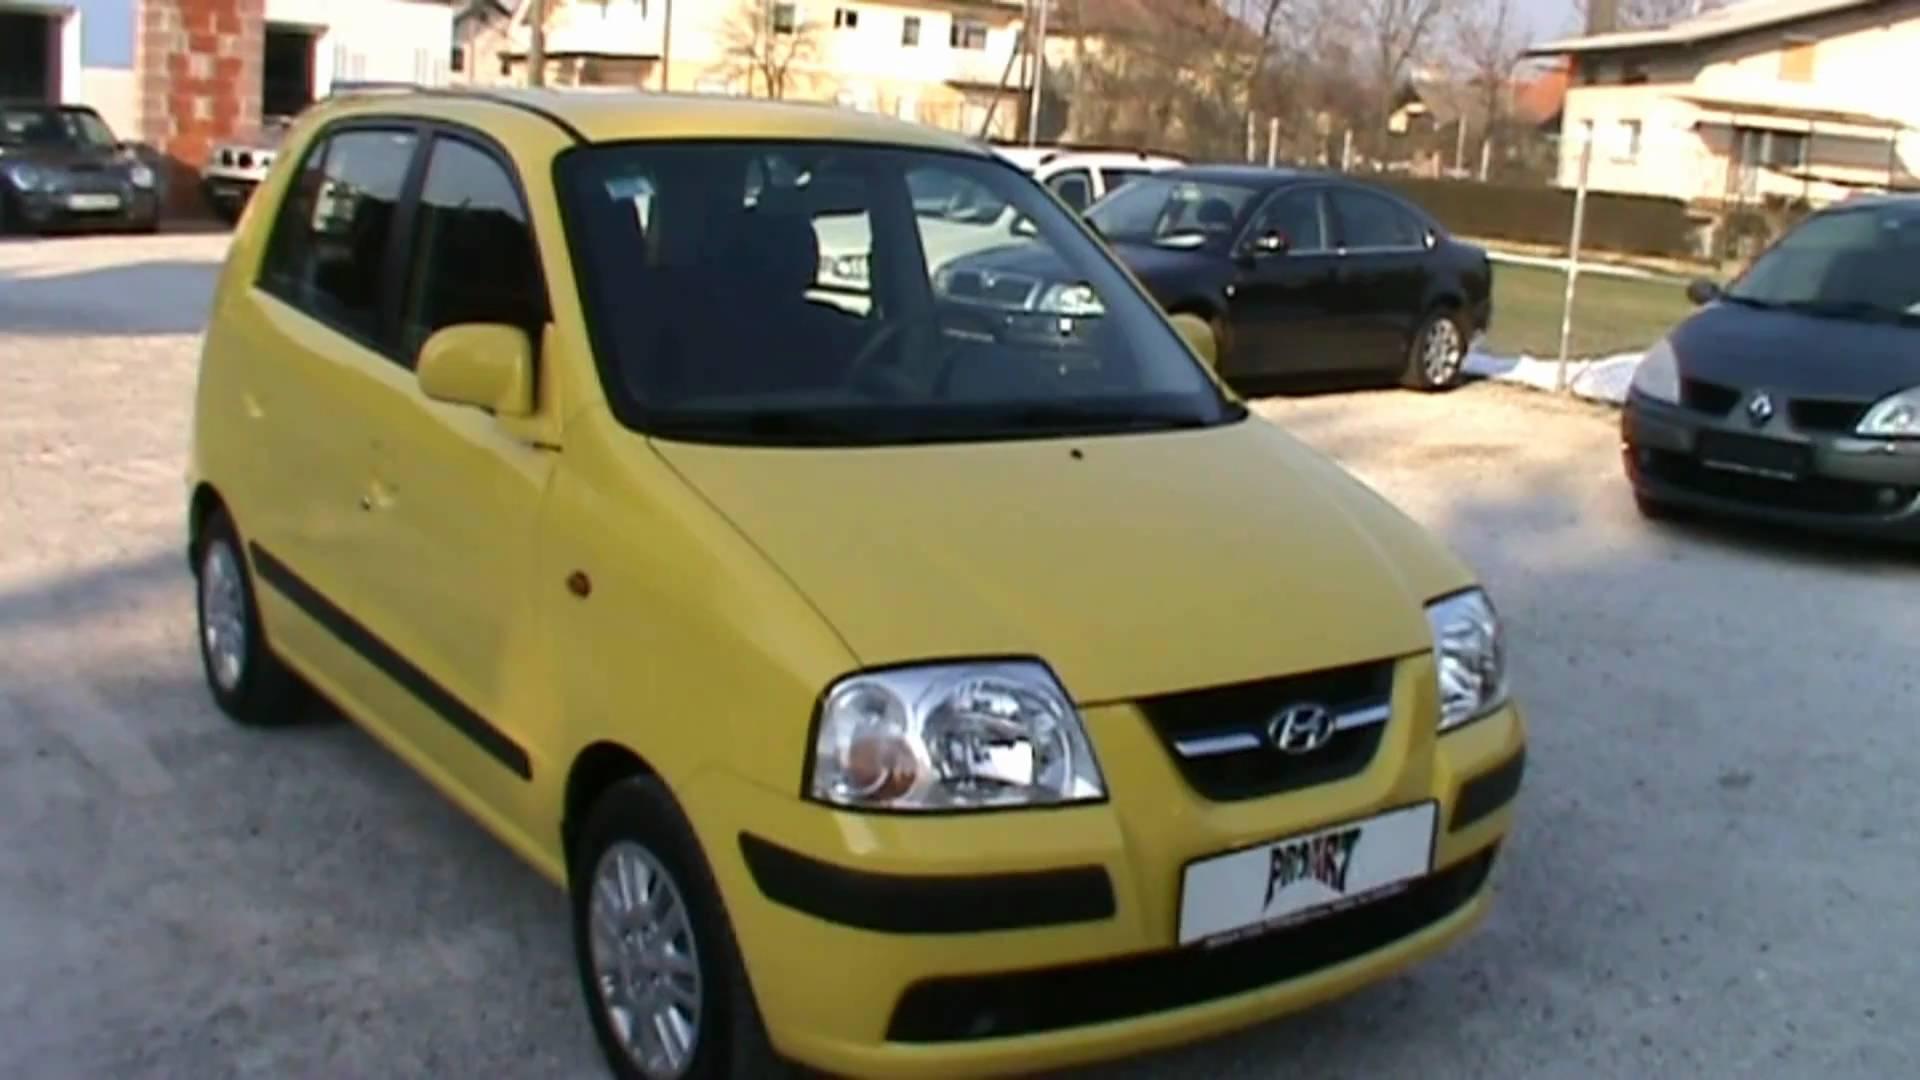 2008 hyundai atos service and repair manual rh repairmanualnow com 2009 Hyundai Atos Prime 2009 Hyundai Atos Prime